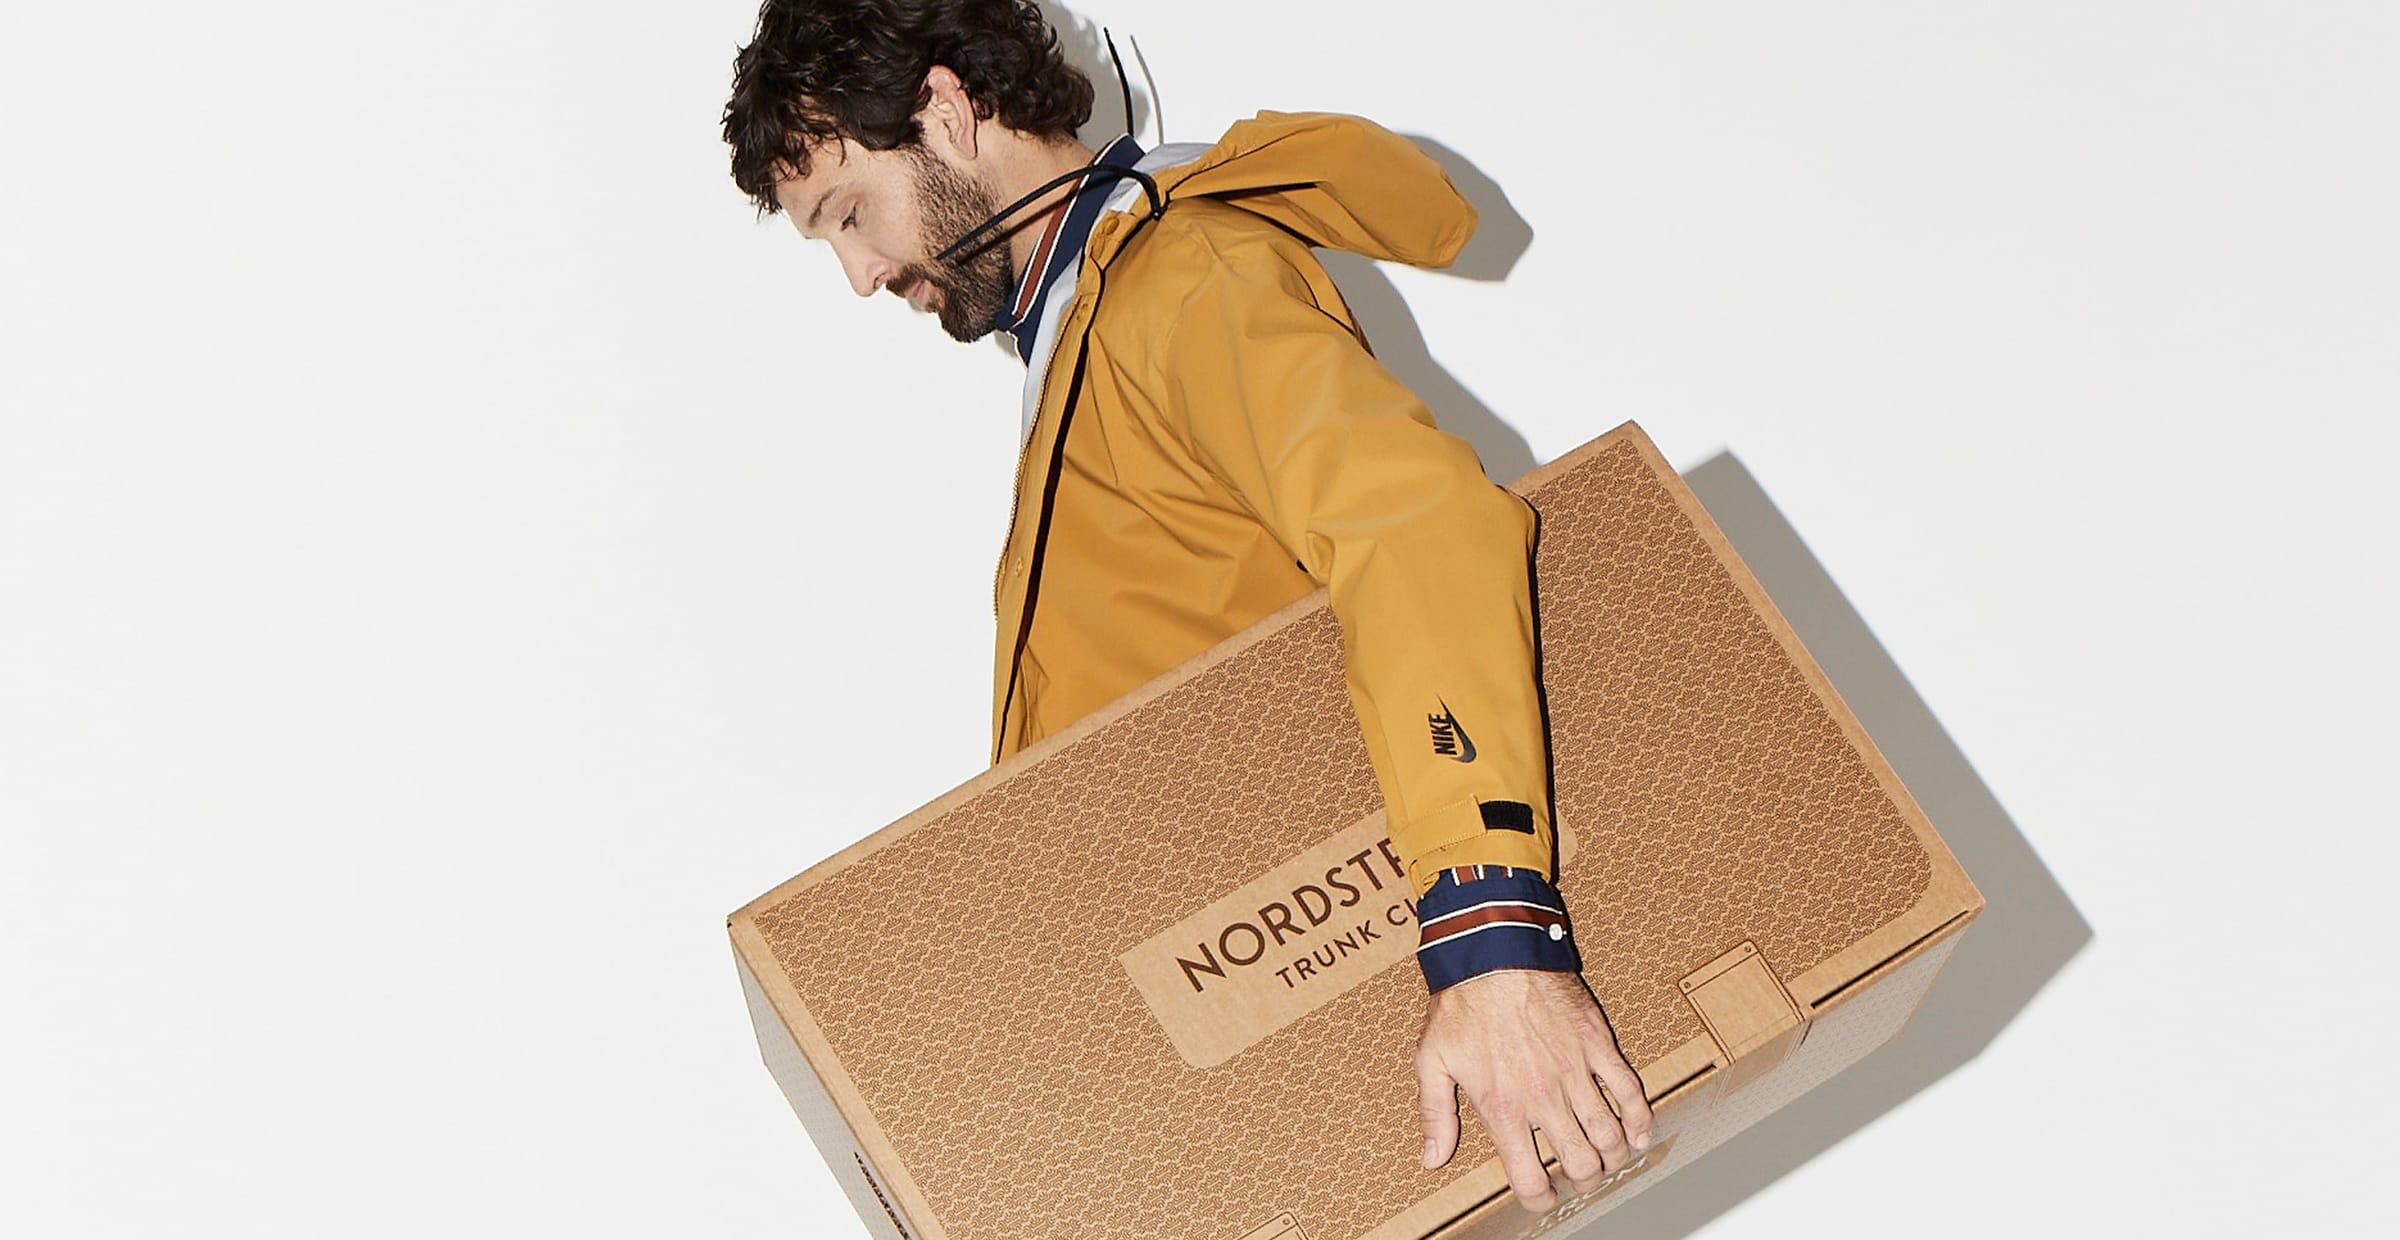 Man carrying subscription box